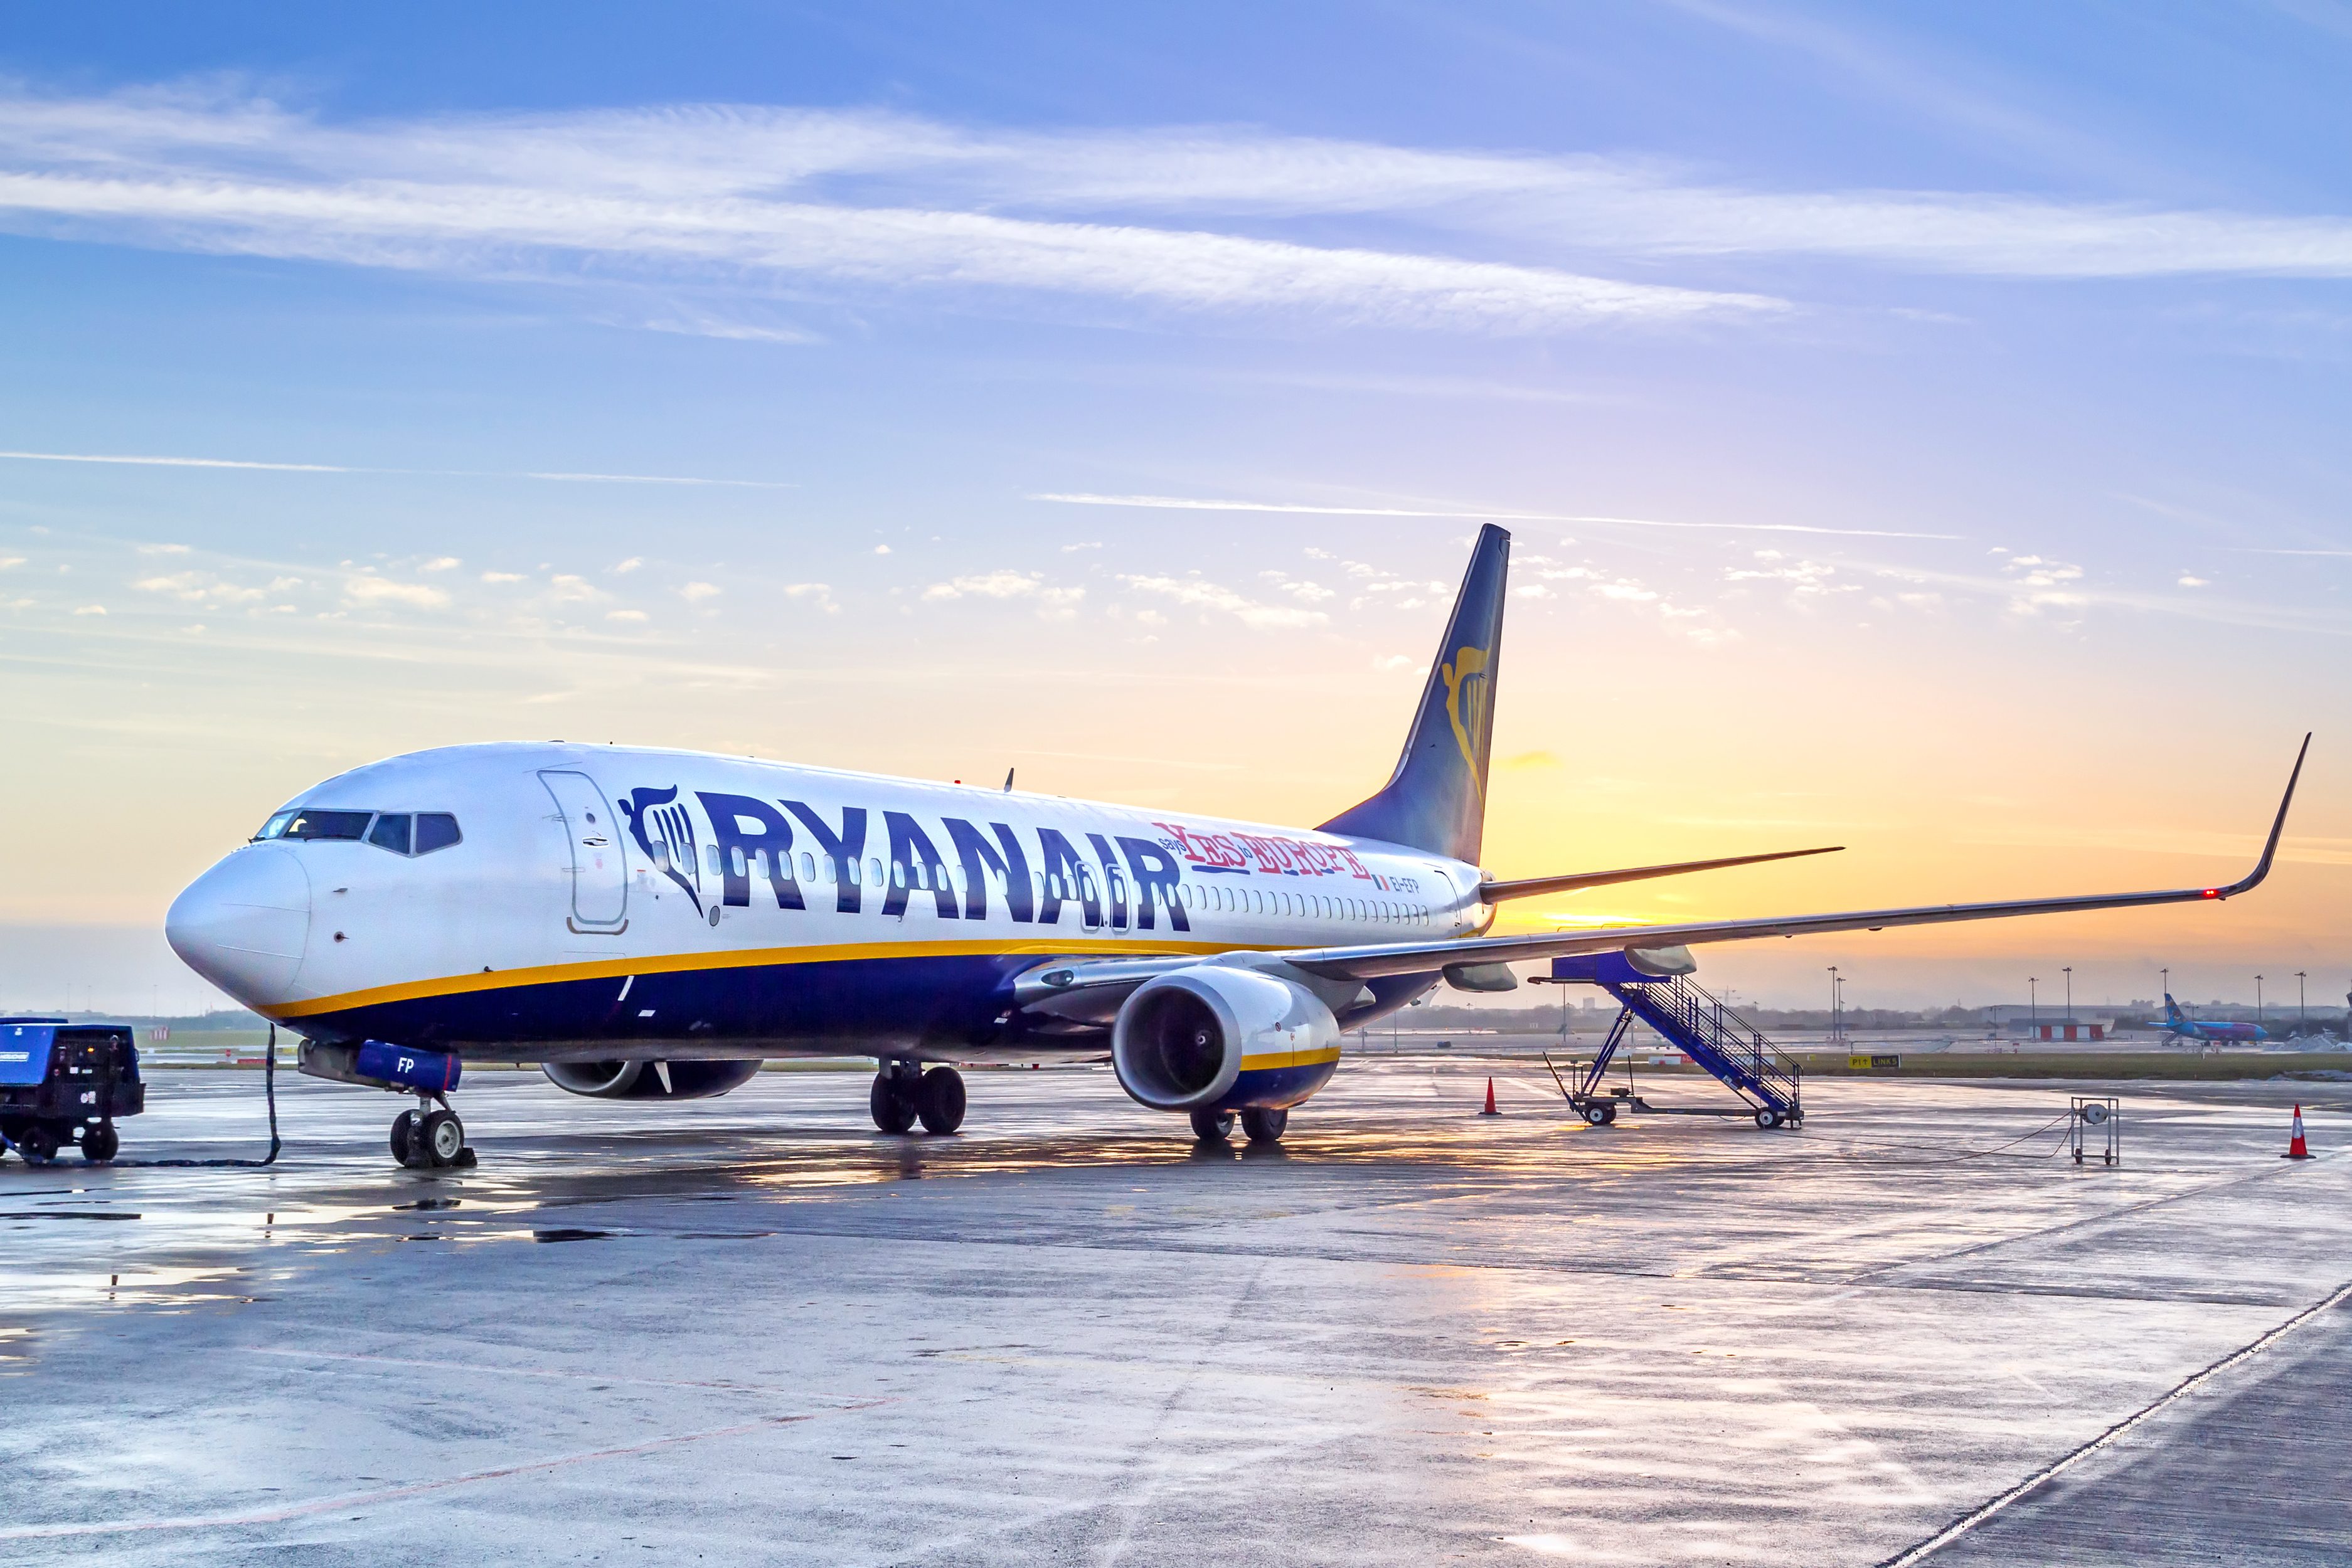 Ryanair skrydziu tvarkarastis is kauno